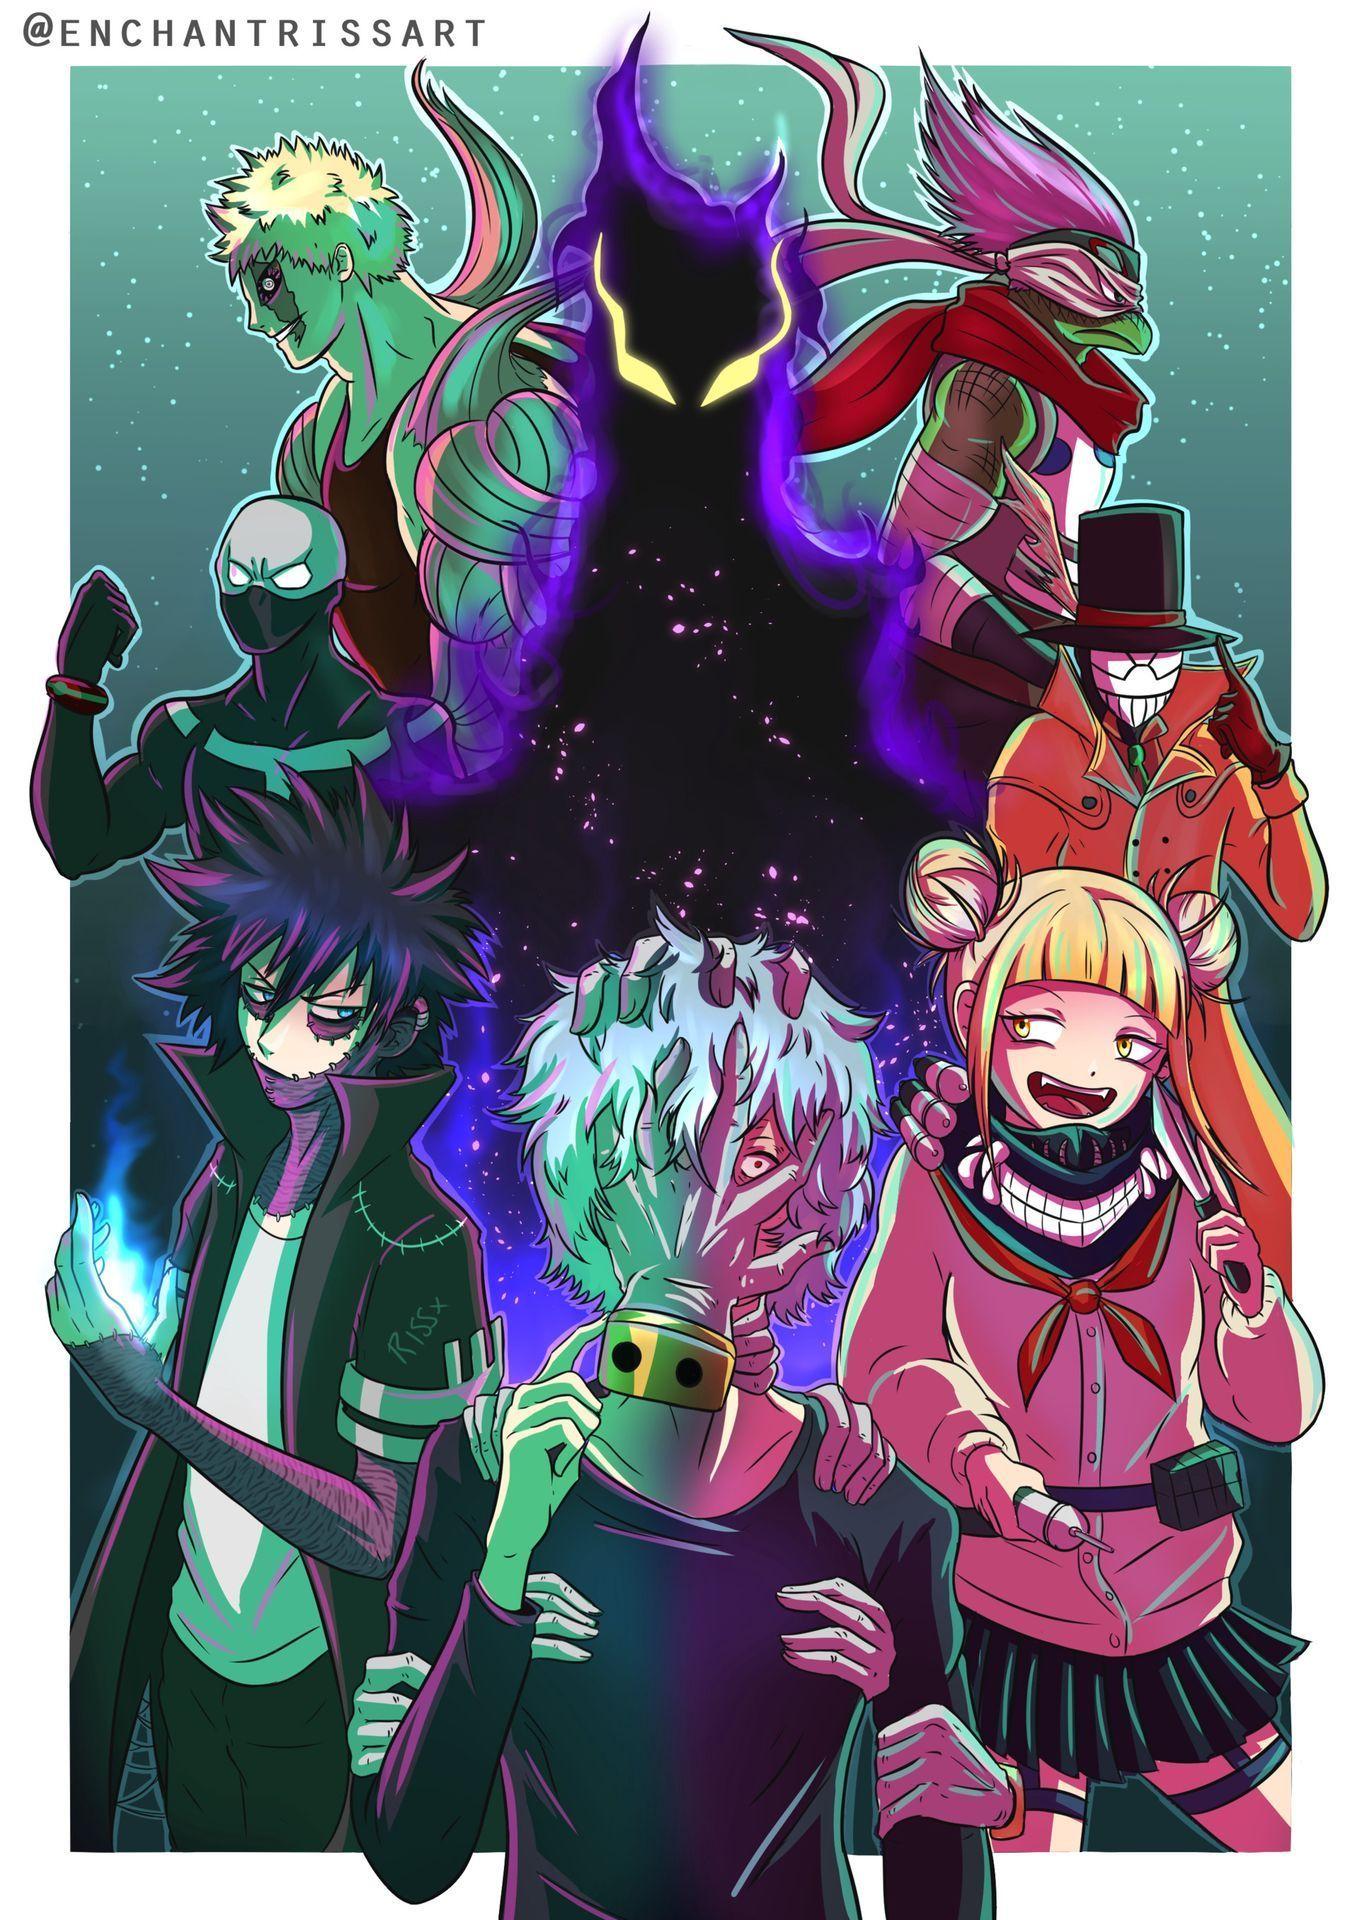 Mha Bnha Picture Book League Of Villians Anime Villians Anime My Hero Academia Episodes